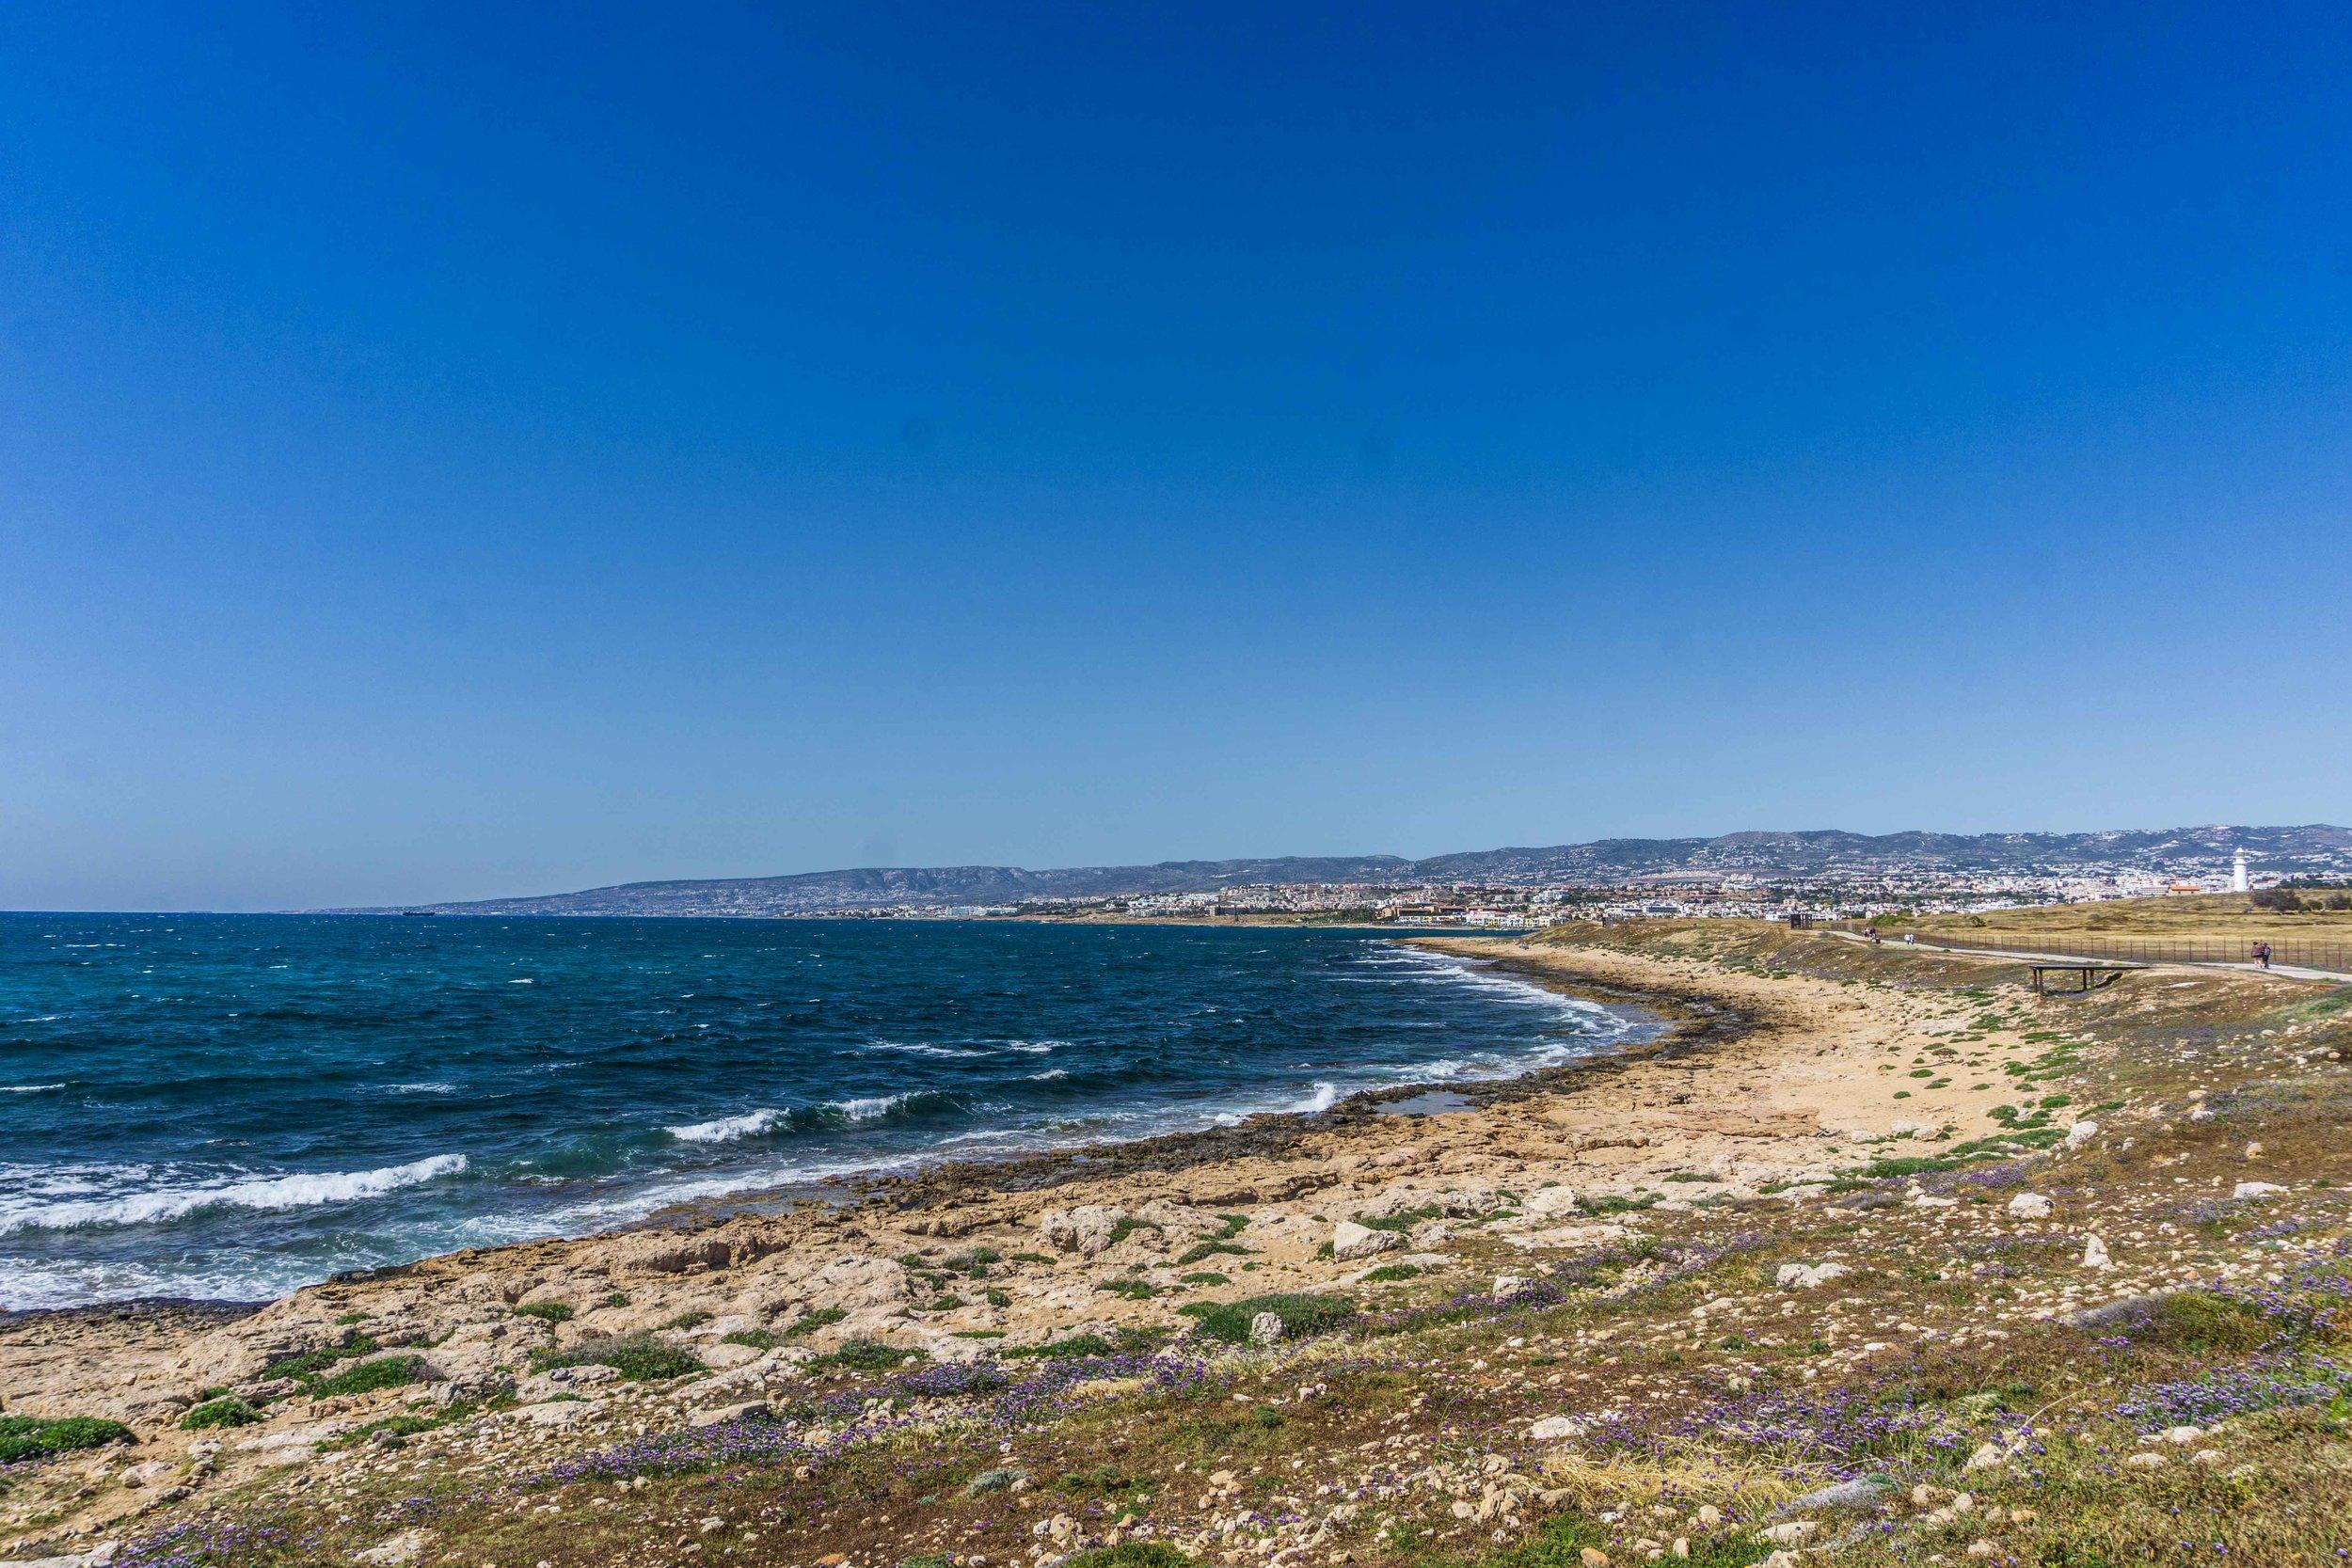 Beach along Pathos